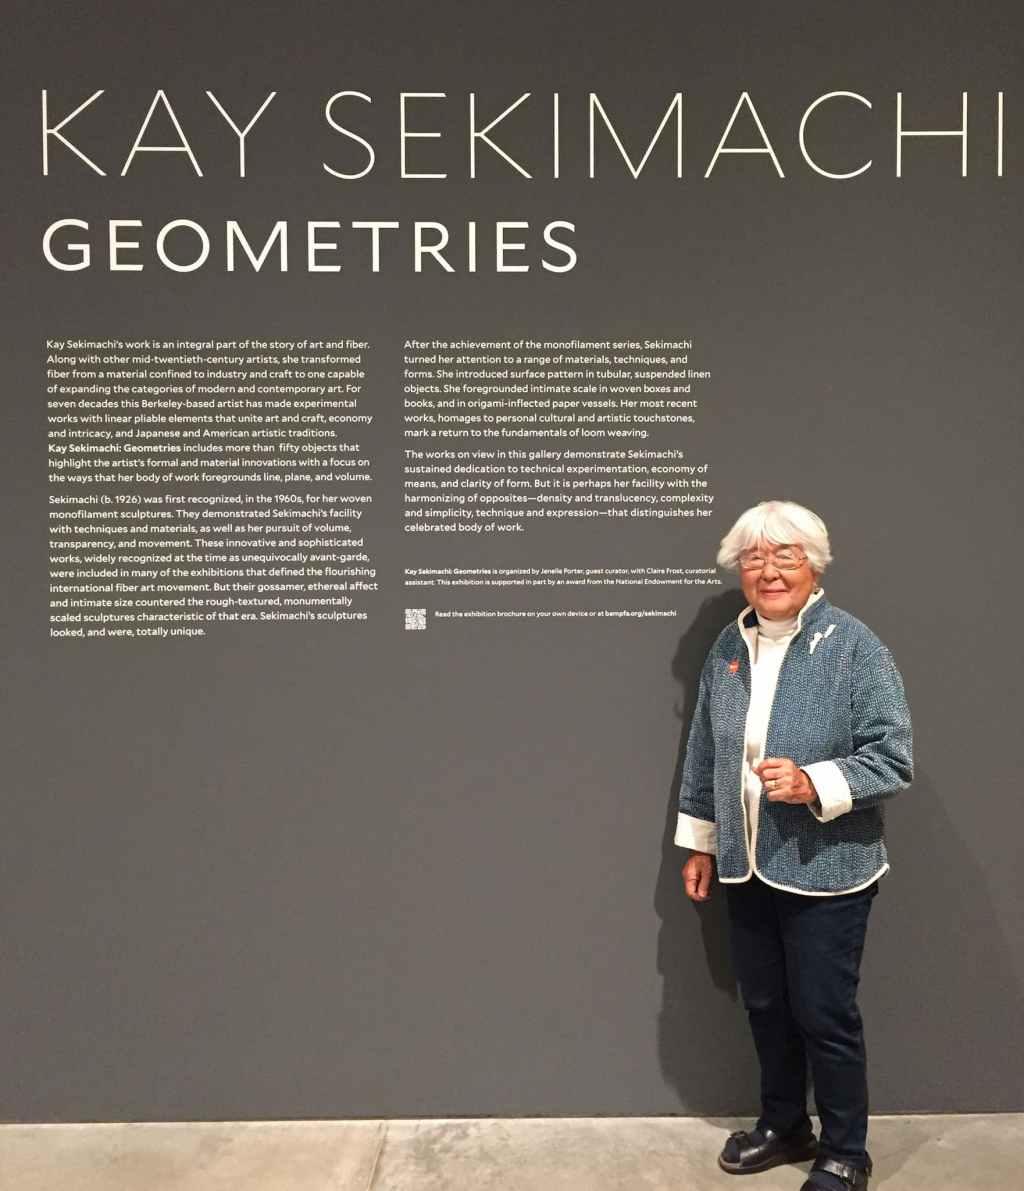 Kay Sekimachi at her Geometries exhibition